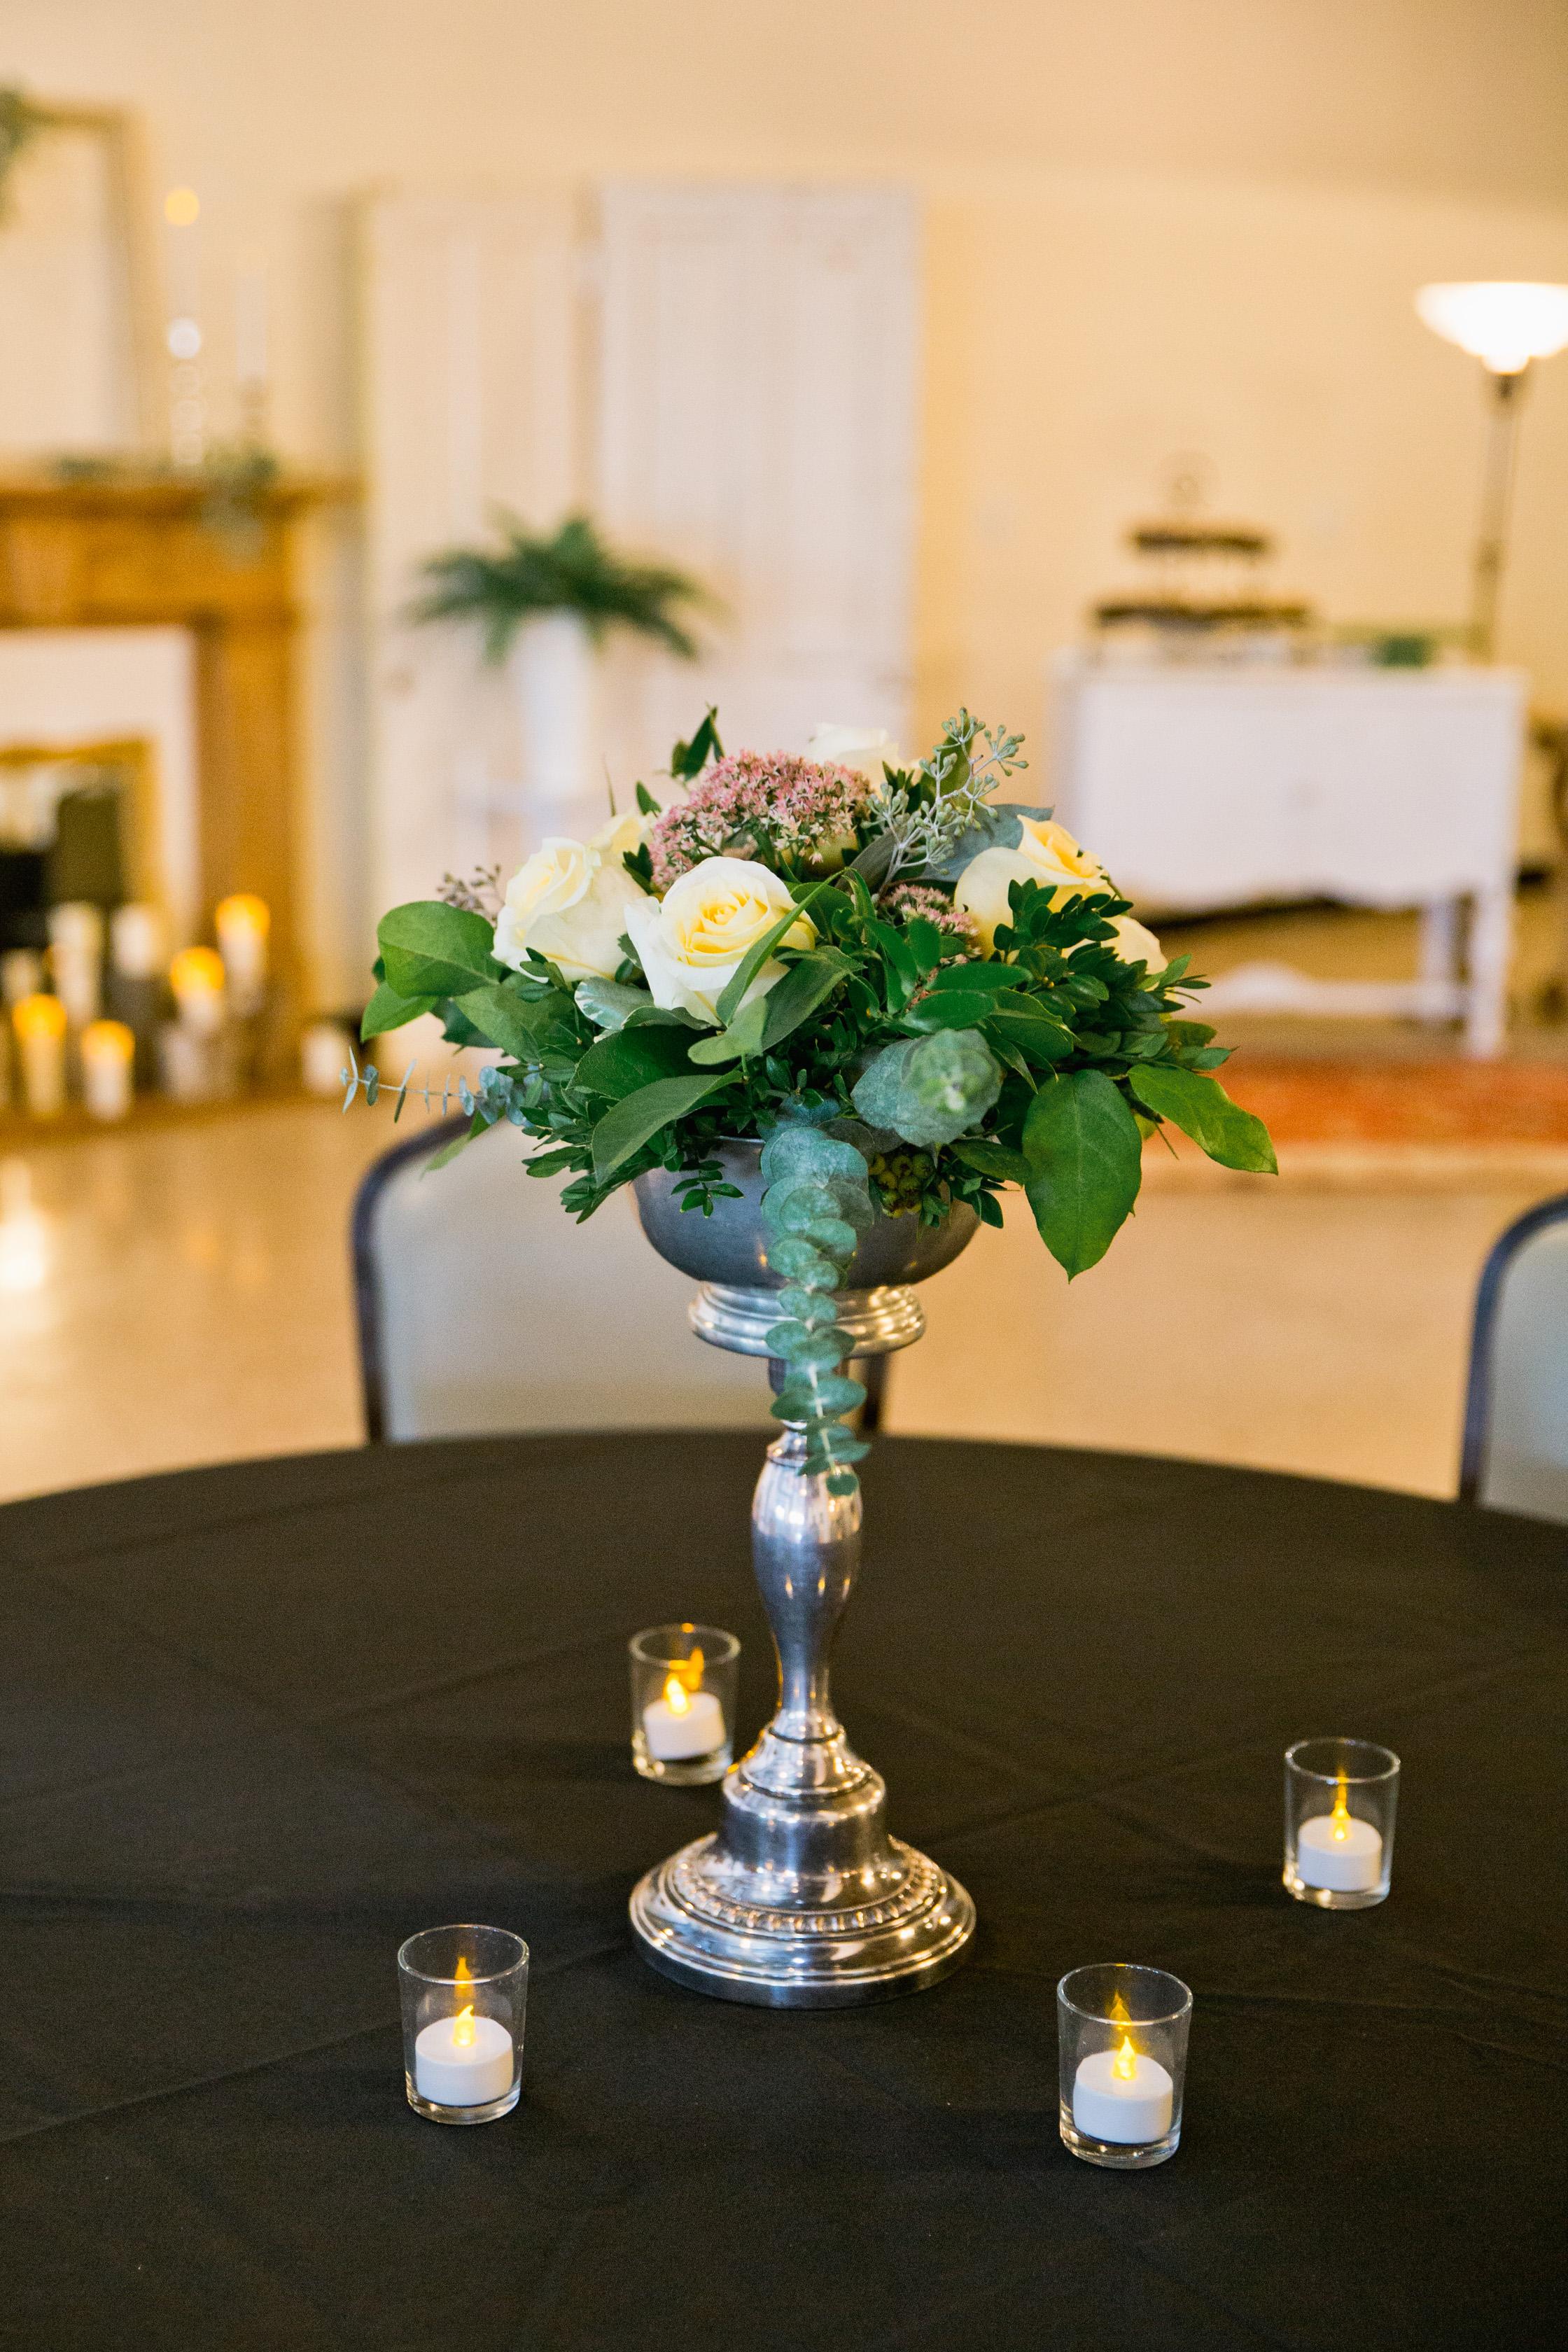 Lavender Blue is the best wedding florist in Des Moines iowa